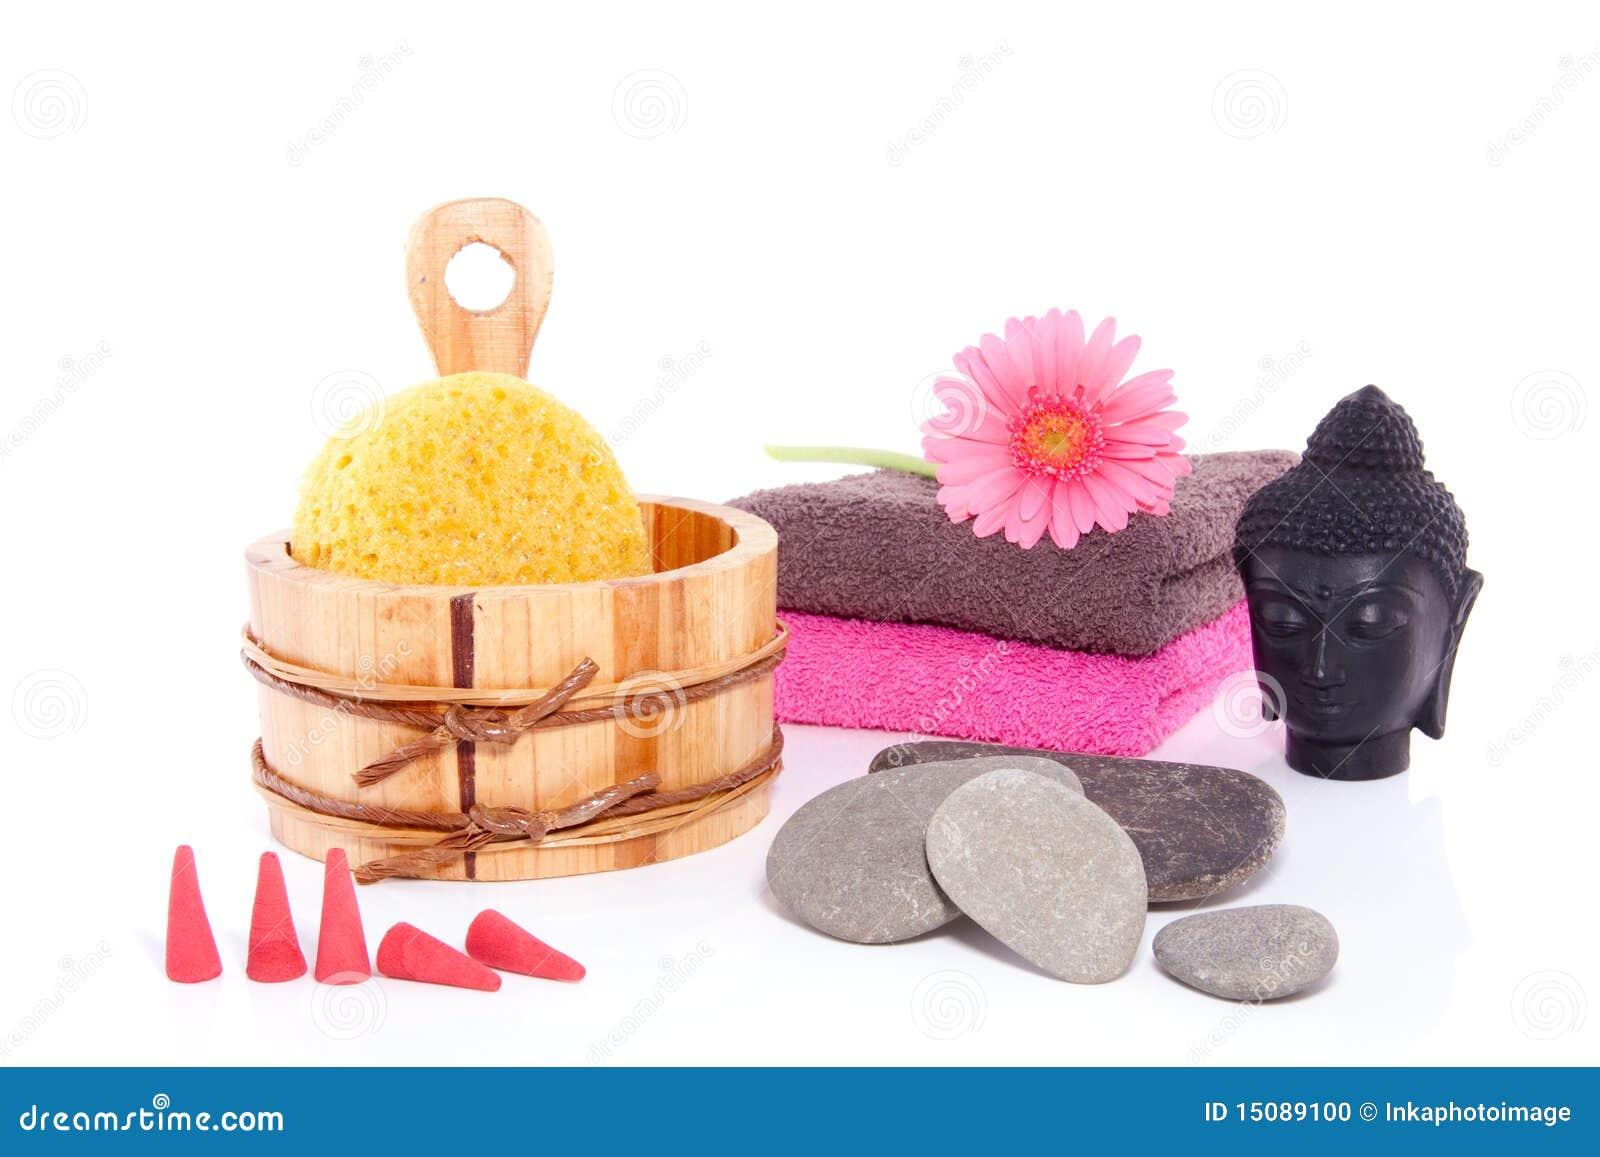 Wellness Decoration With Budha Stock Photo Image 15089100